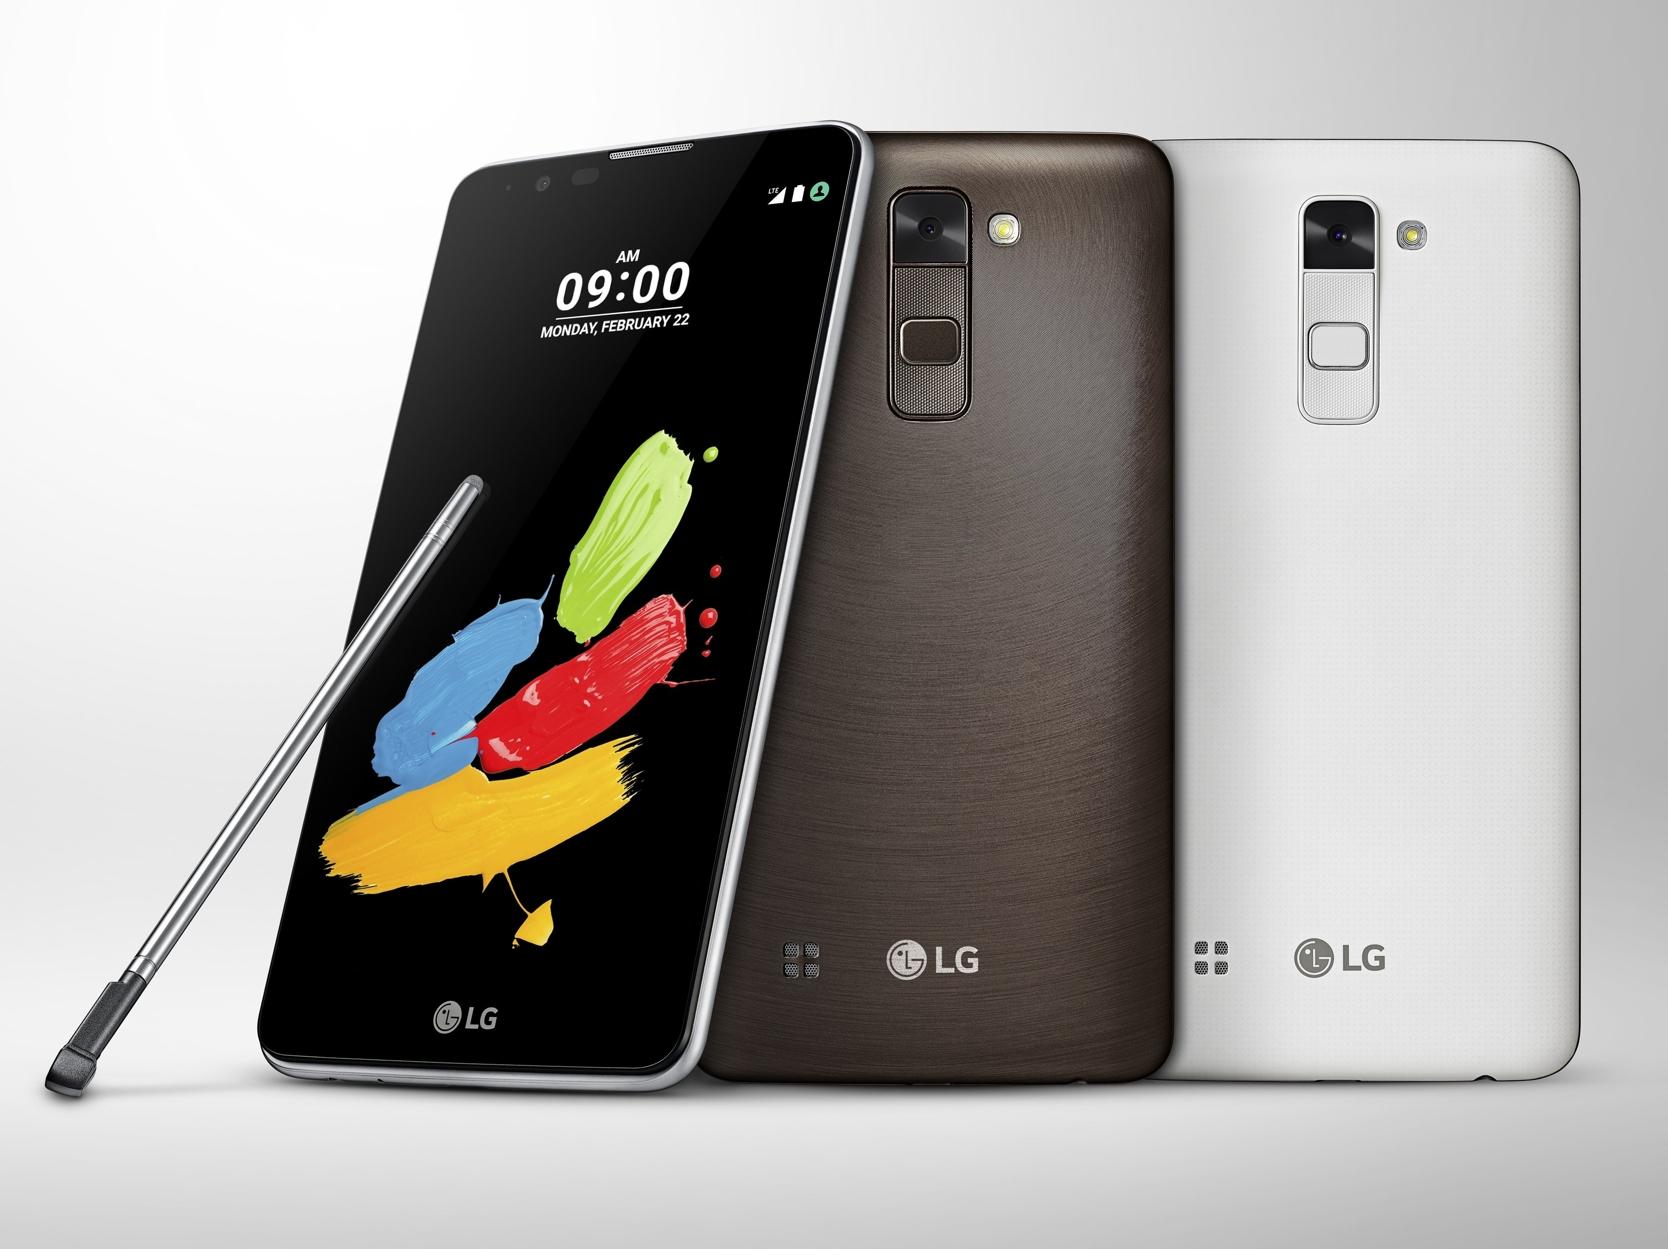 lg-stylus-2-mg-bey-pic1.jpg